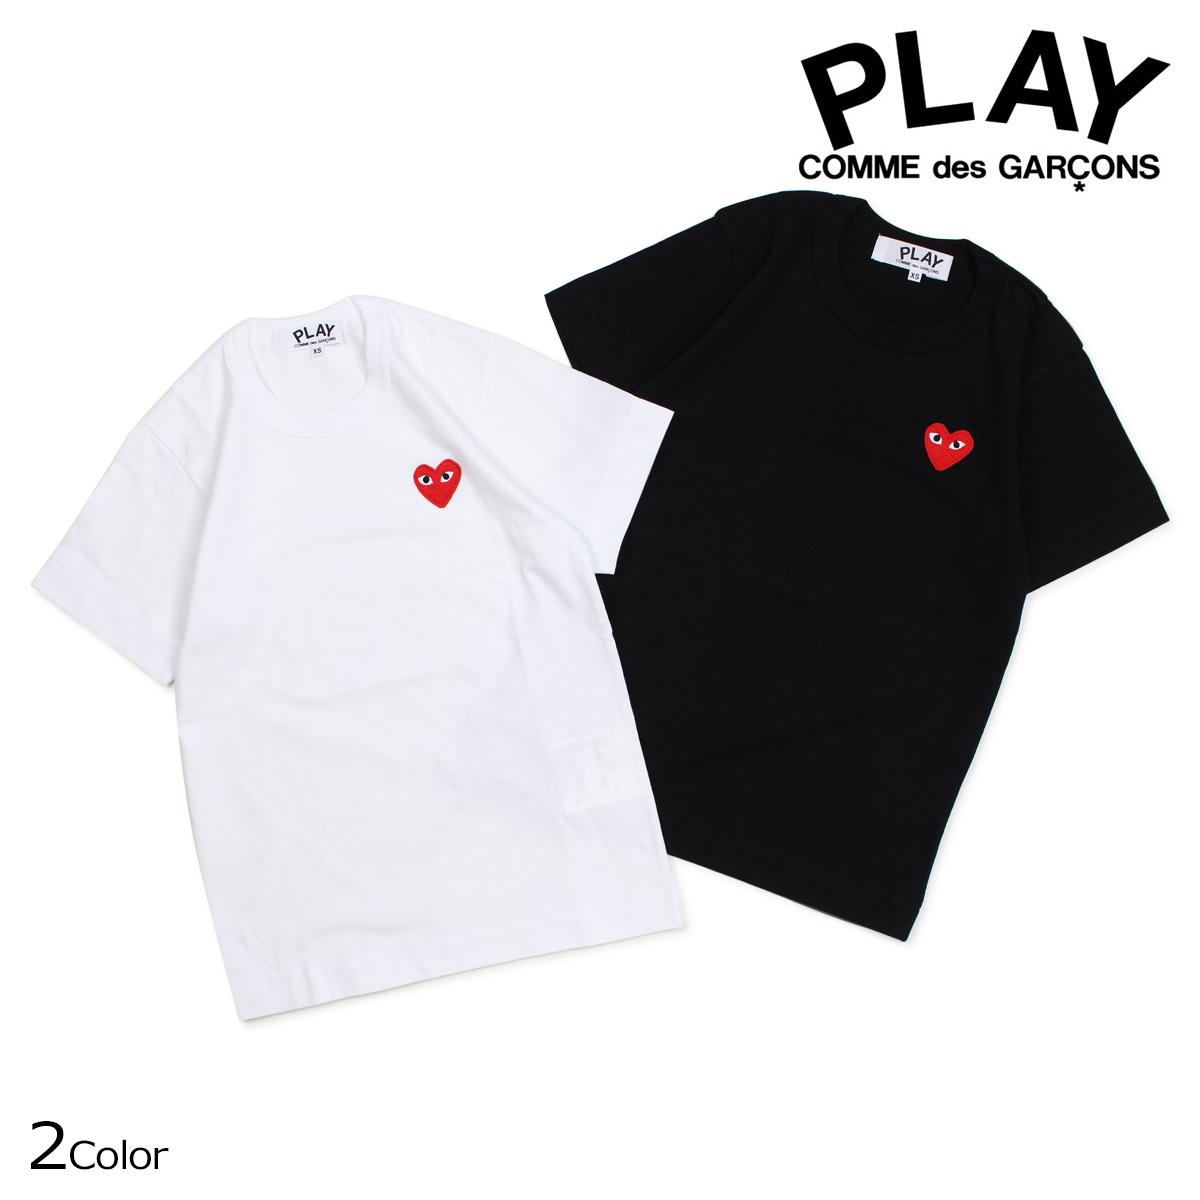 COMME des GARCONS PLAY Tシャツ 半袖 コムデギャルソン レディース RED HEART T-SHIRT ブラック ホワイト AZT107